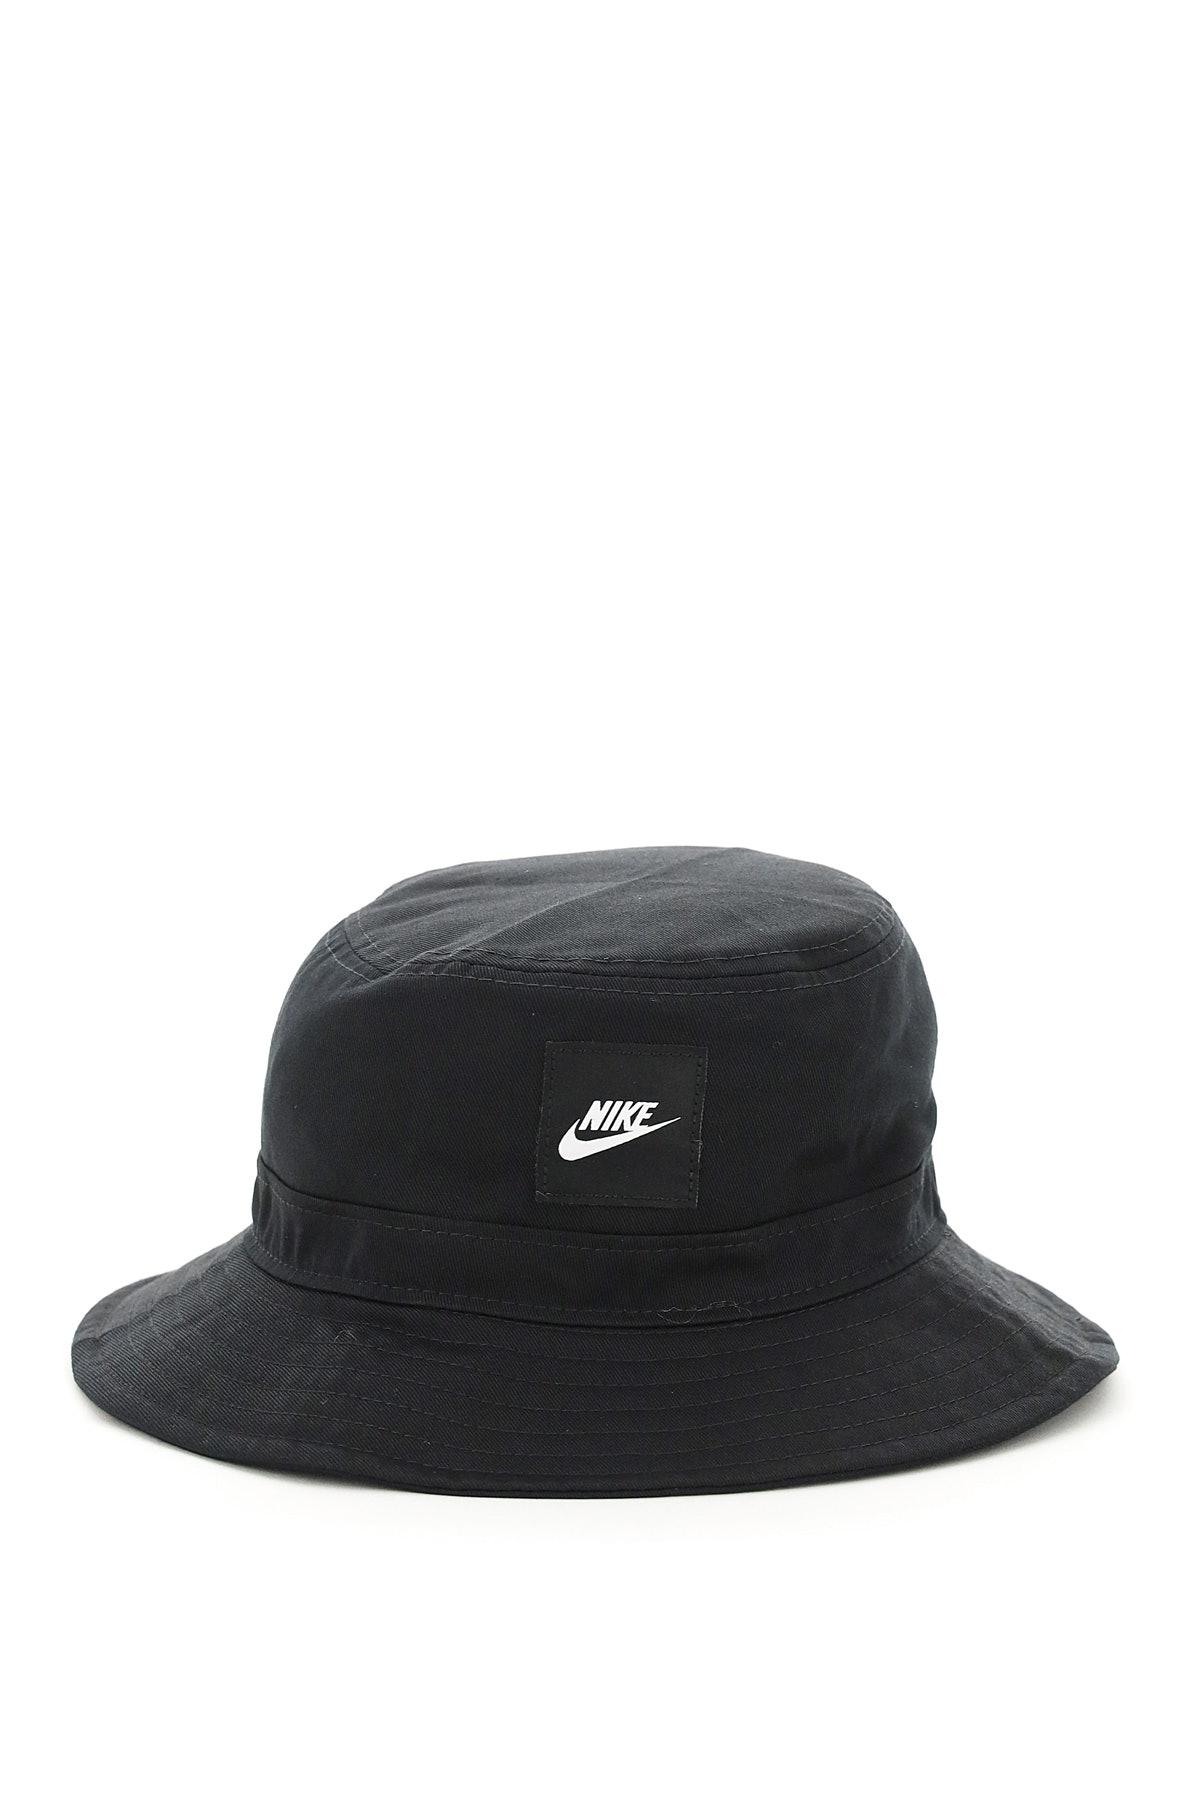 Nike Futura Core Bucket Hat: image 1